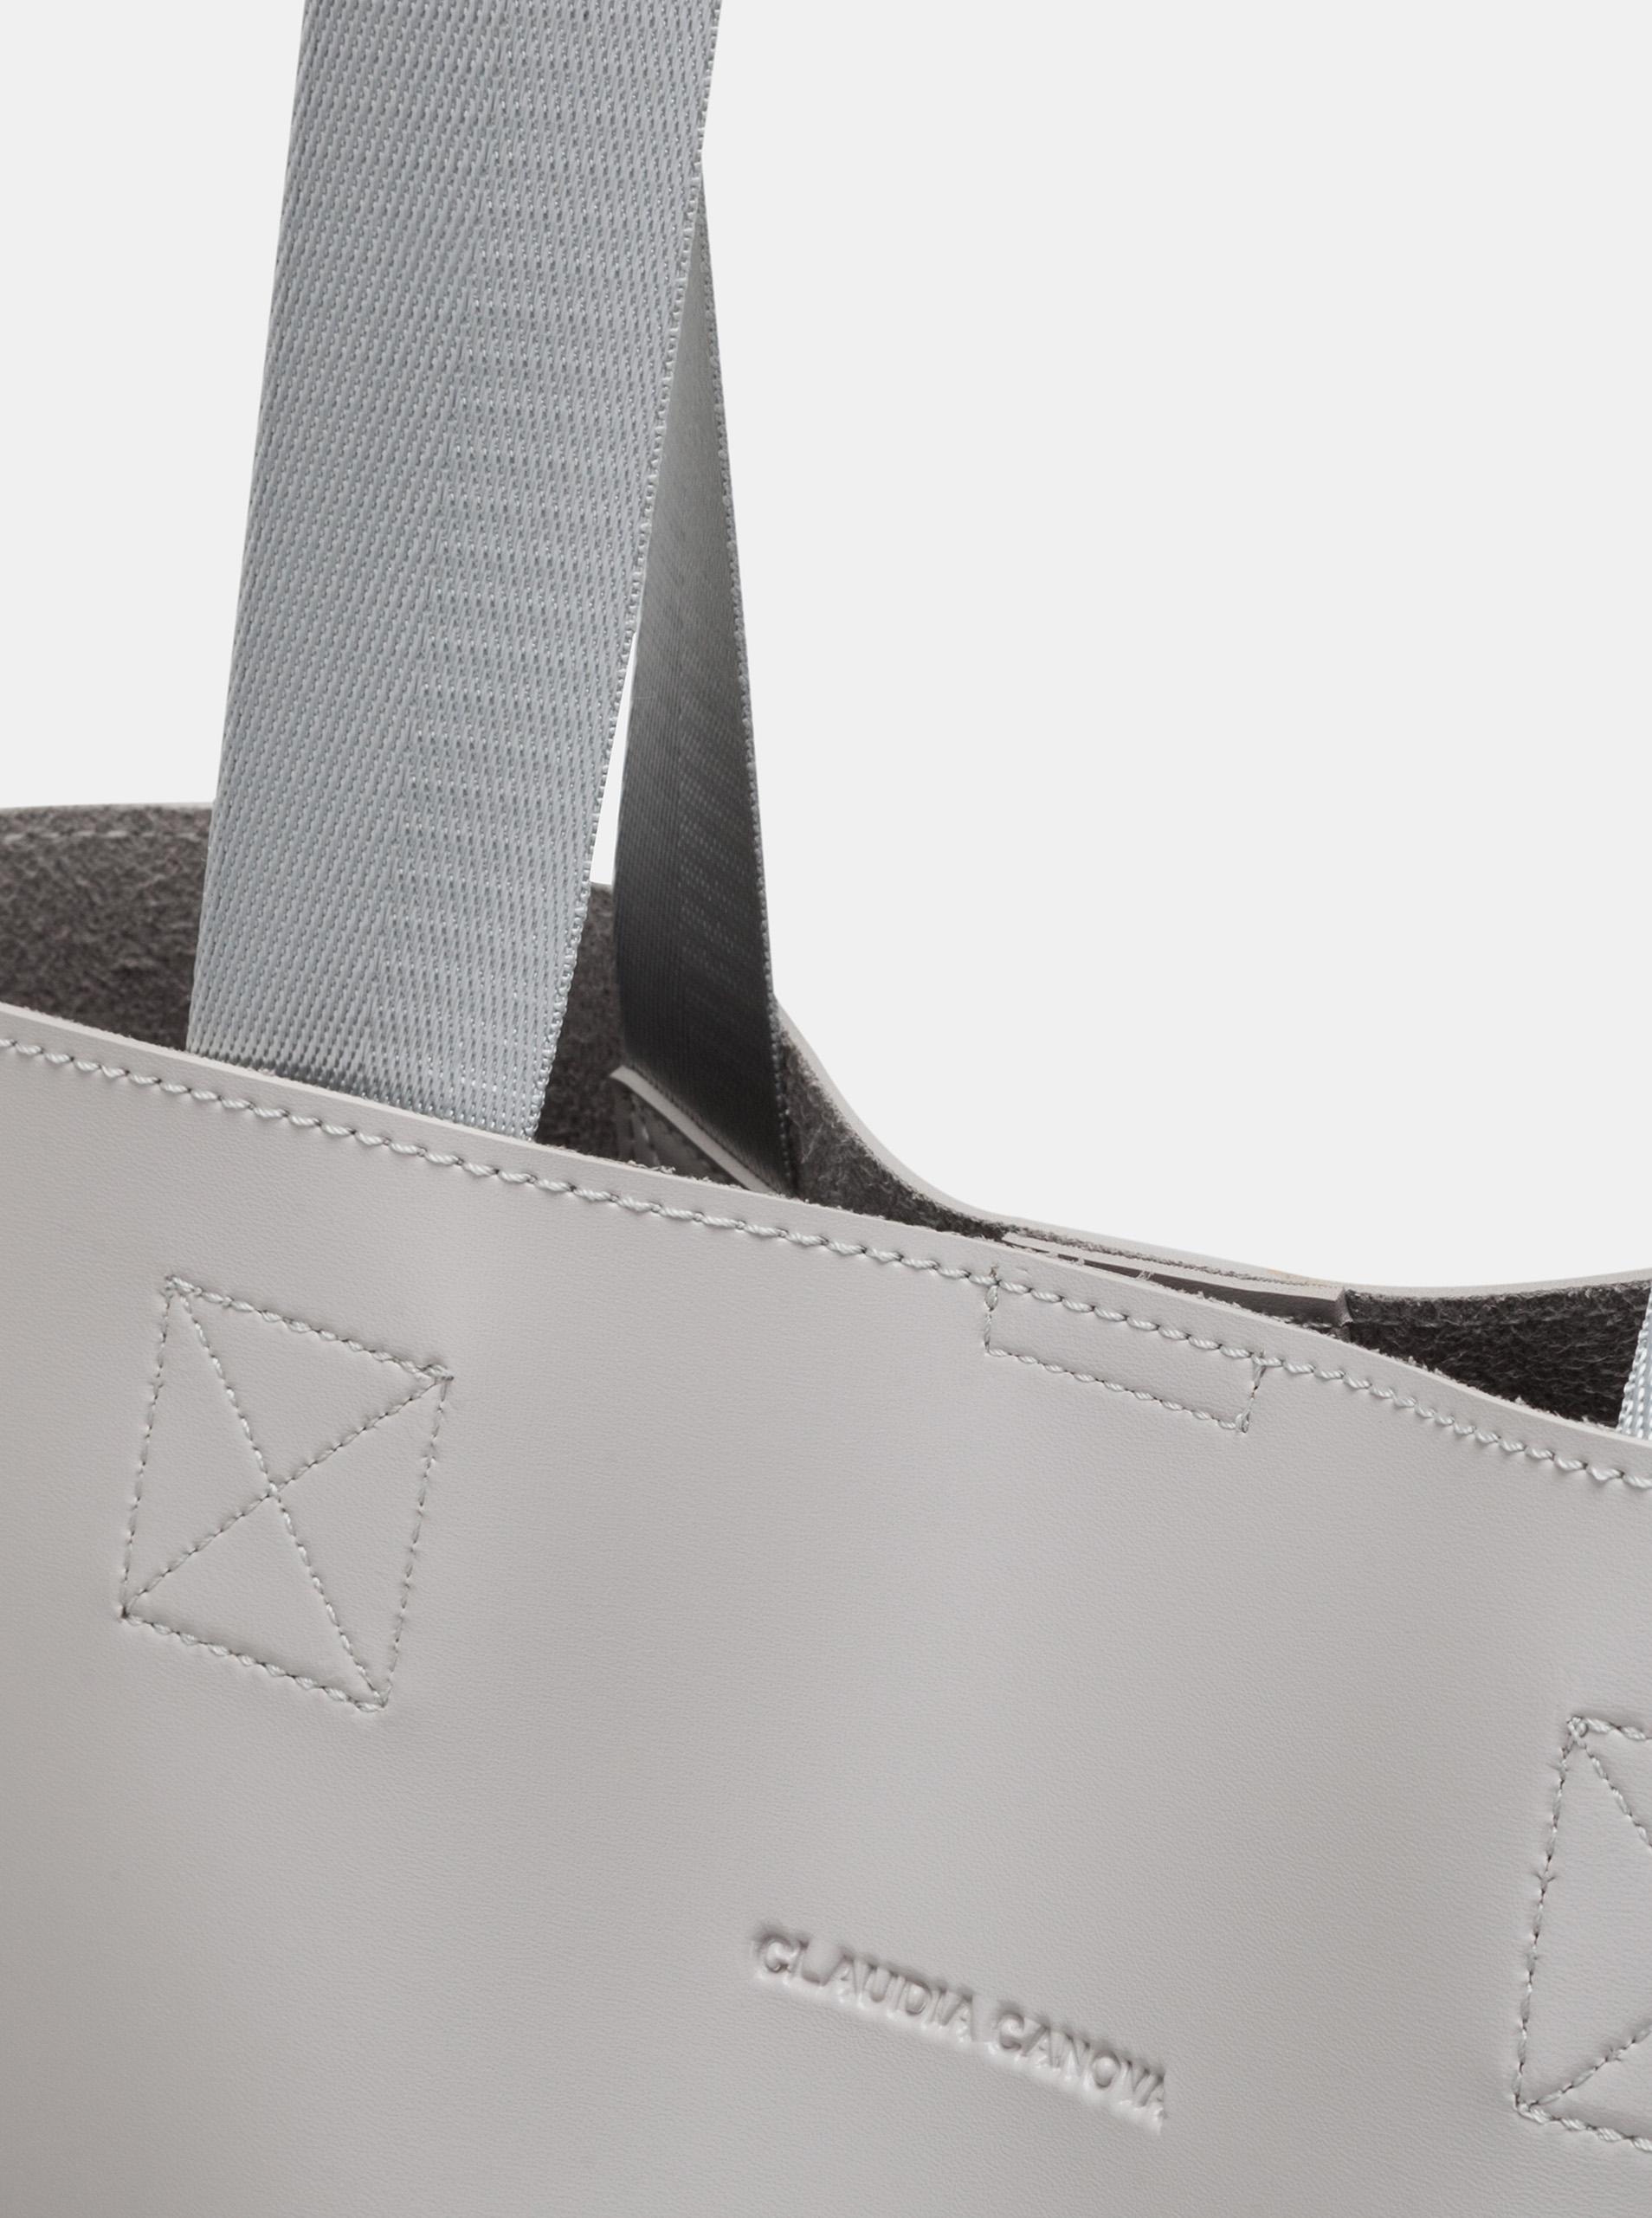 Claudia Canova siva torbica